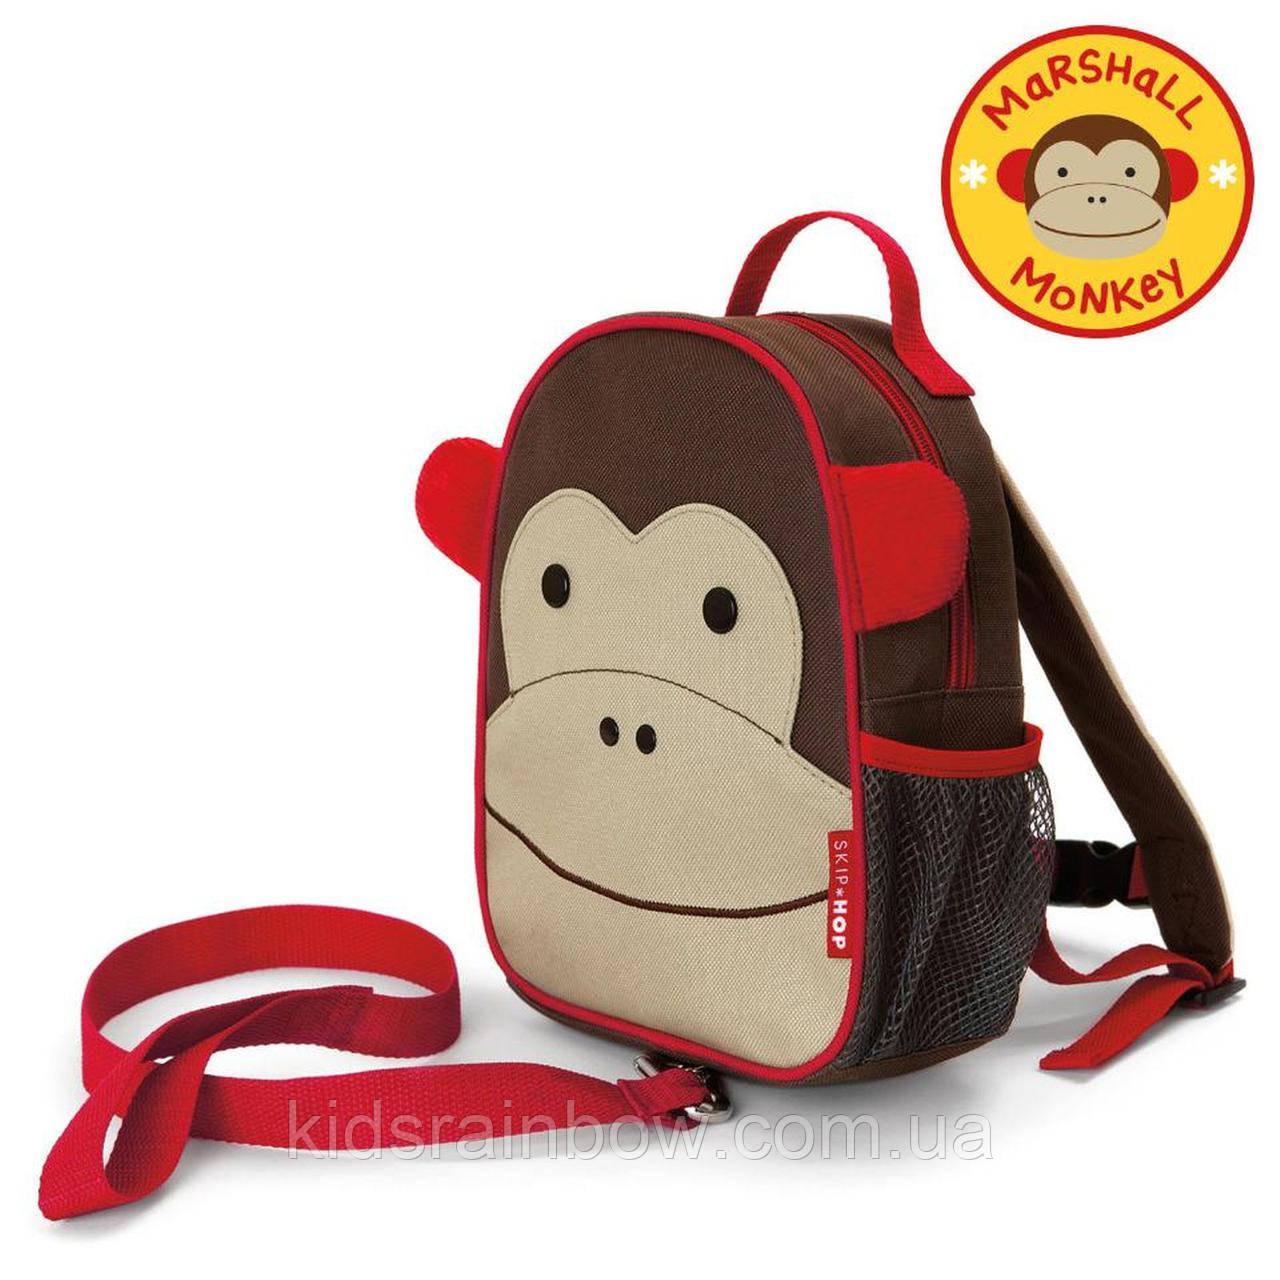 Рюкзак детский Skip Hop с ремешком безопасности Мартышка